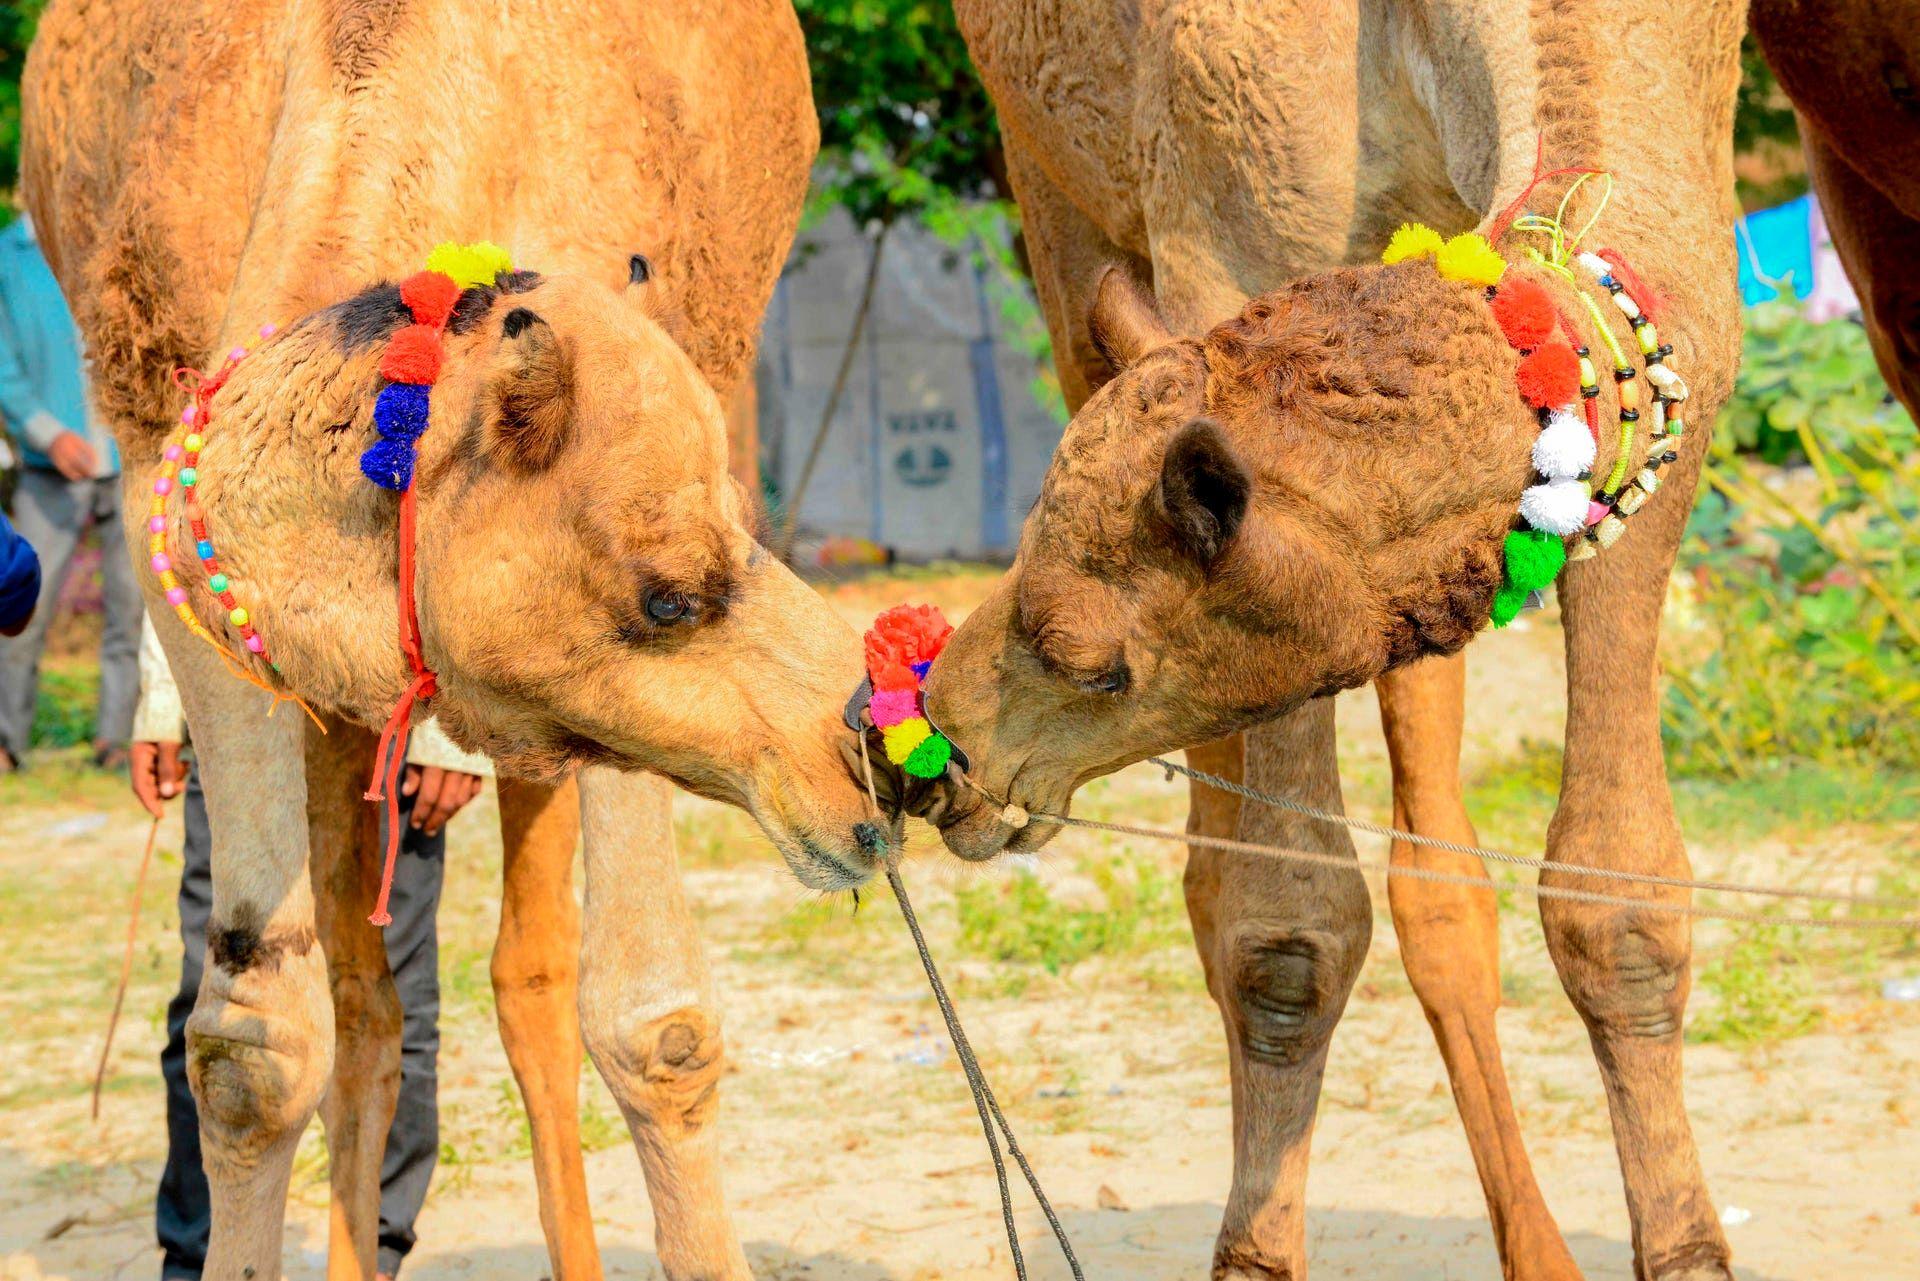 برترین تصاویر خبری ۲۴ ساعت گذشته/ 22 آبان